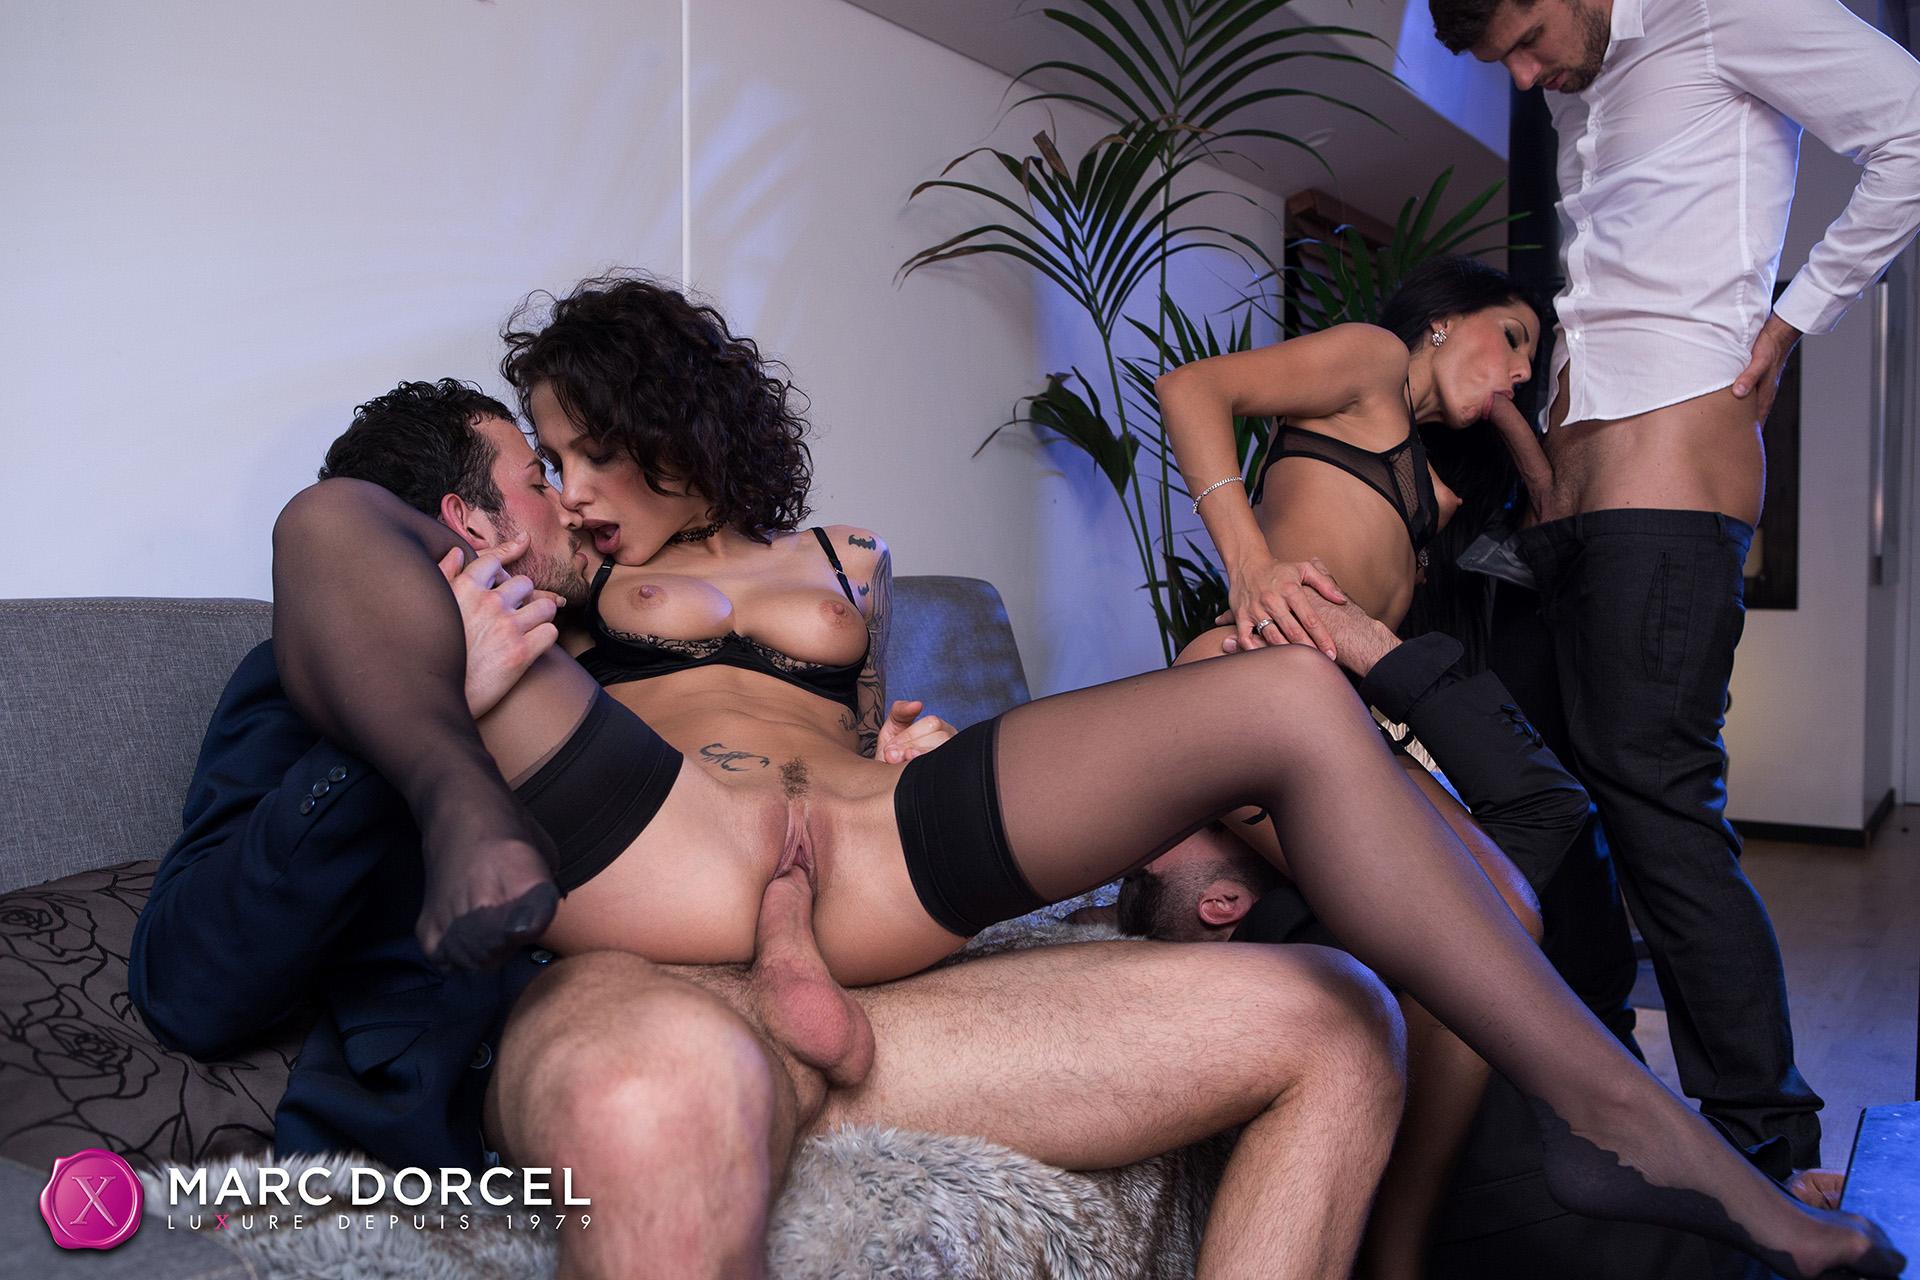 sex with three men